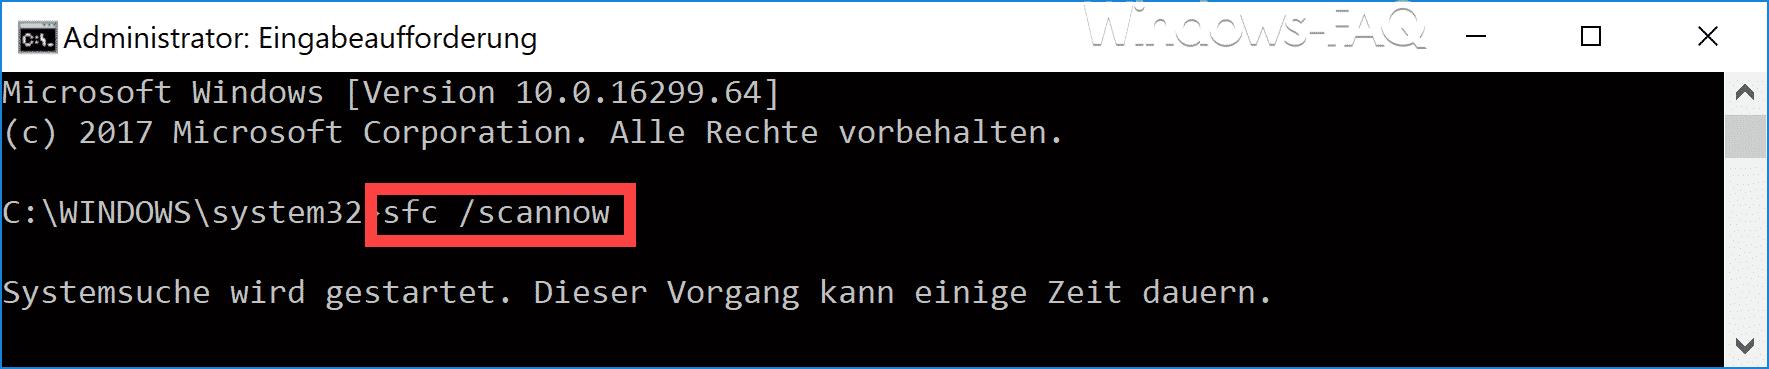 Critical Process Died  U2013 Bluescreen  Bsod  Fehlercode